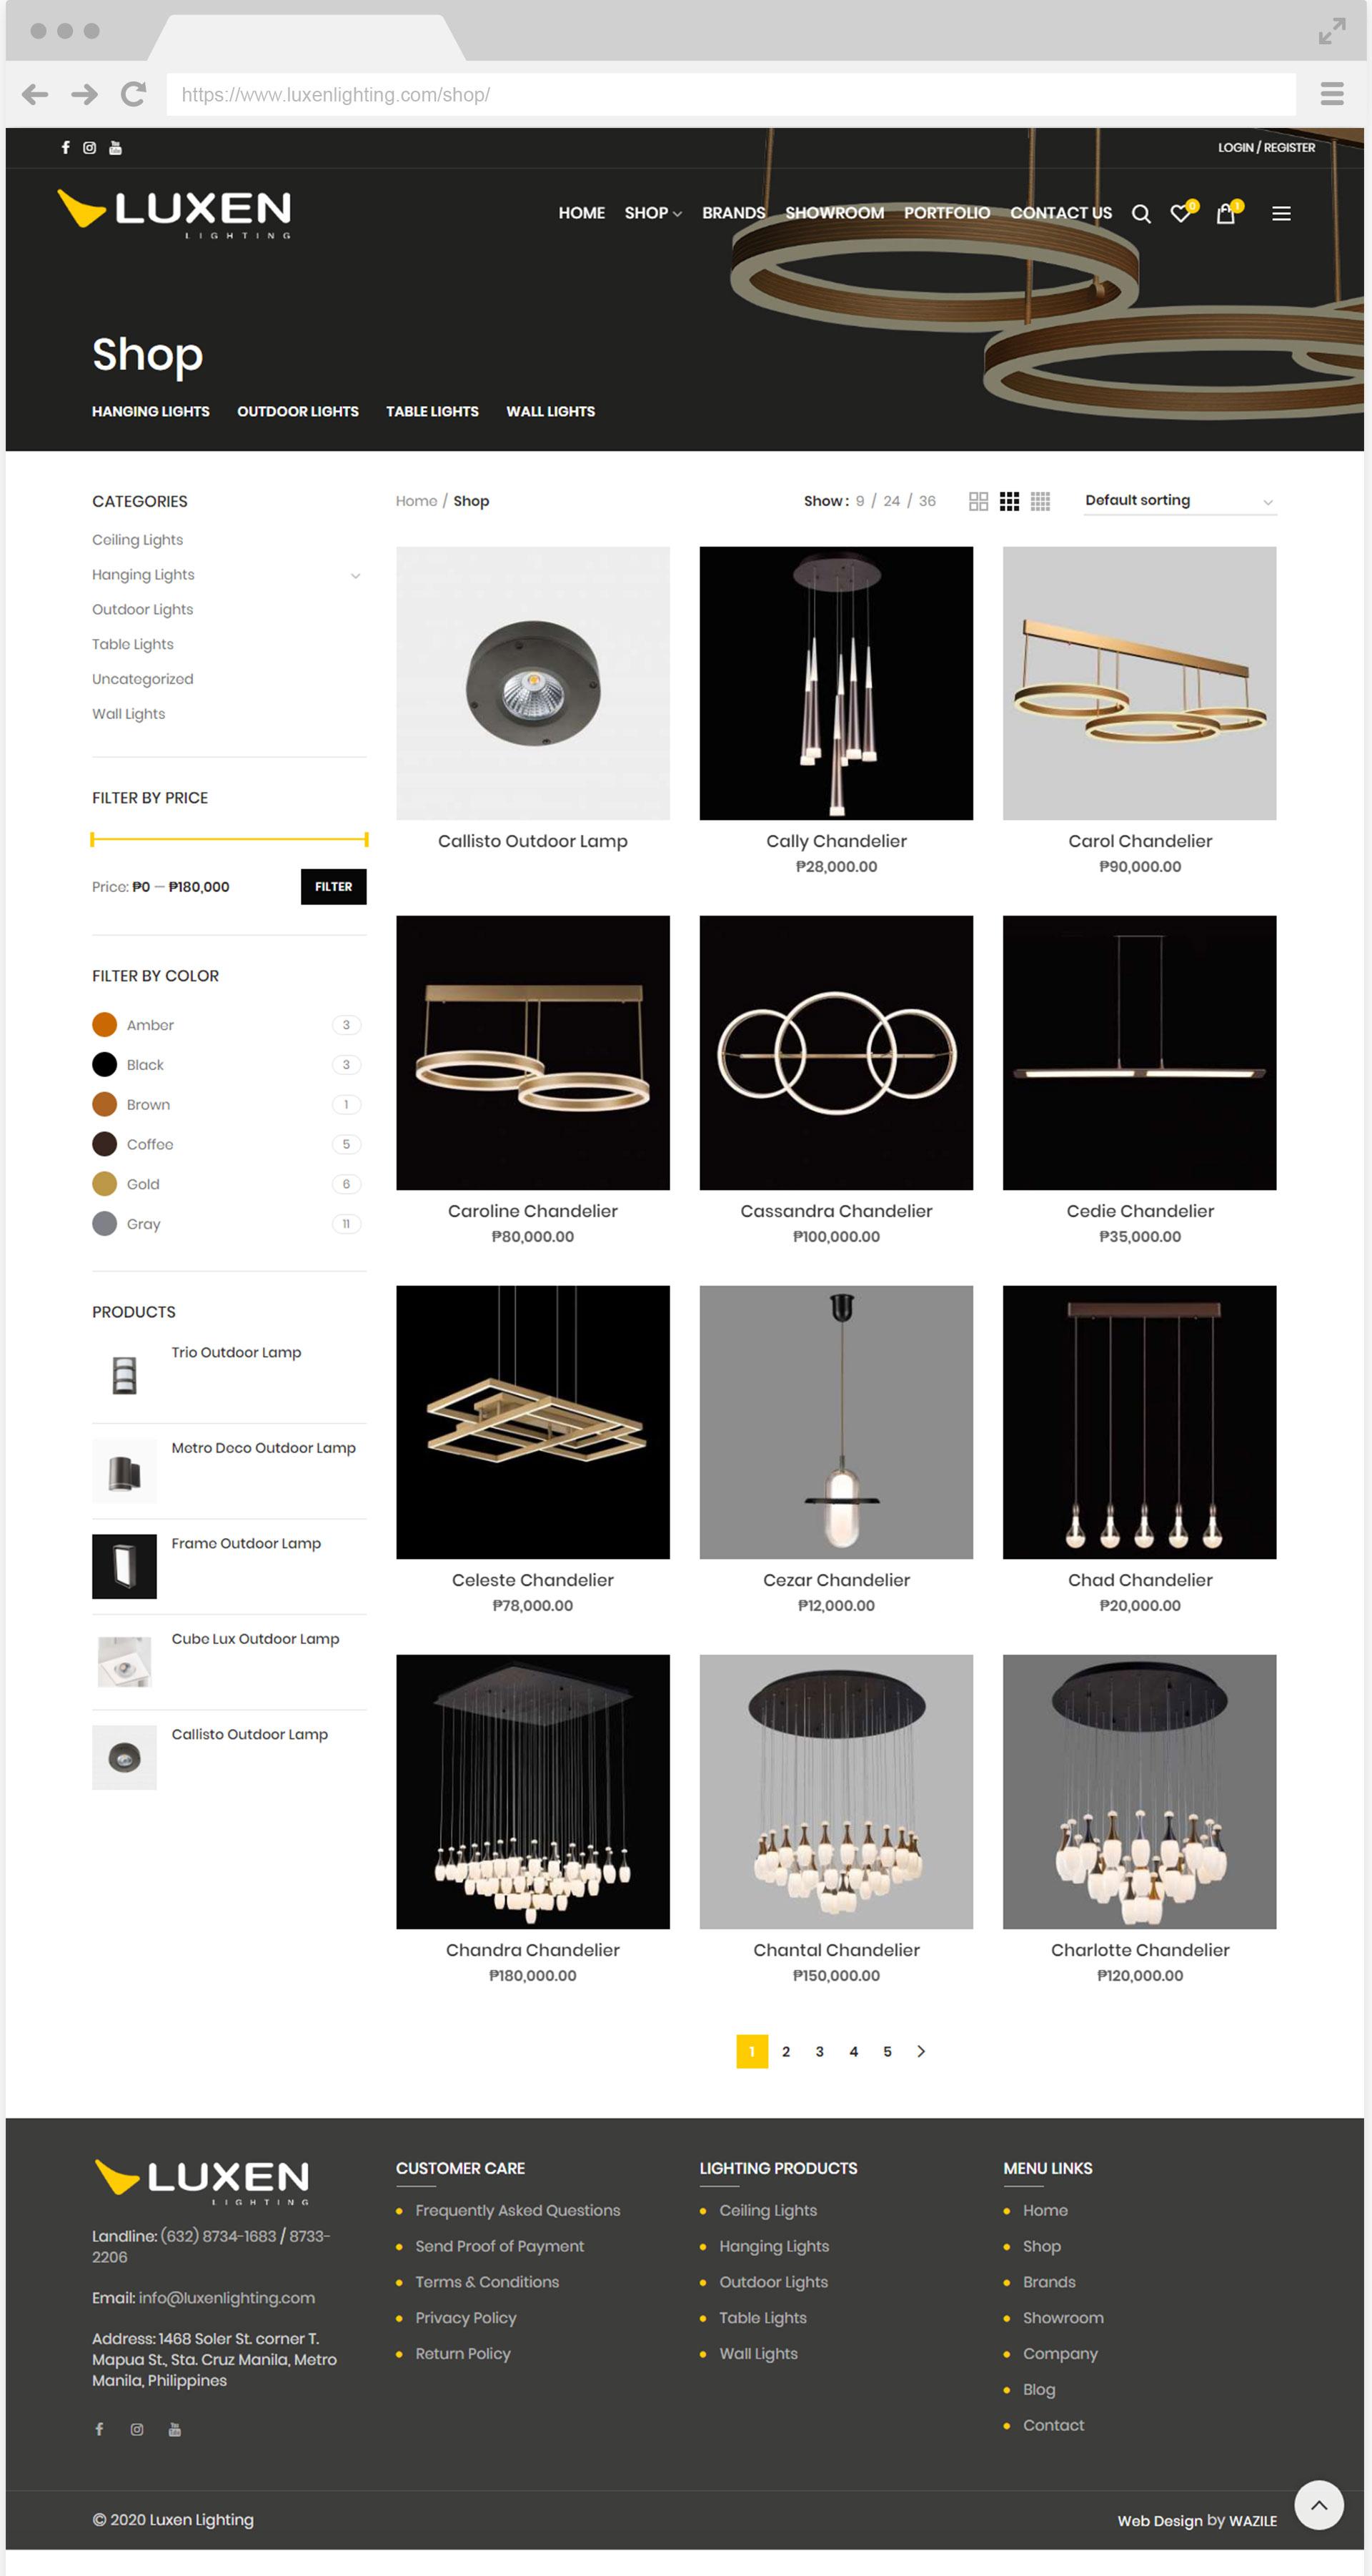 Luxen Lighting Shop